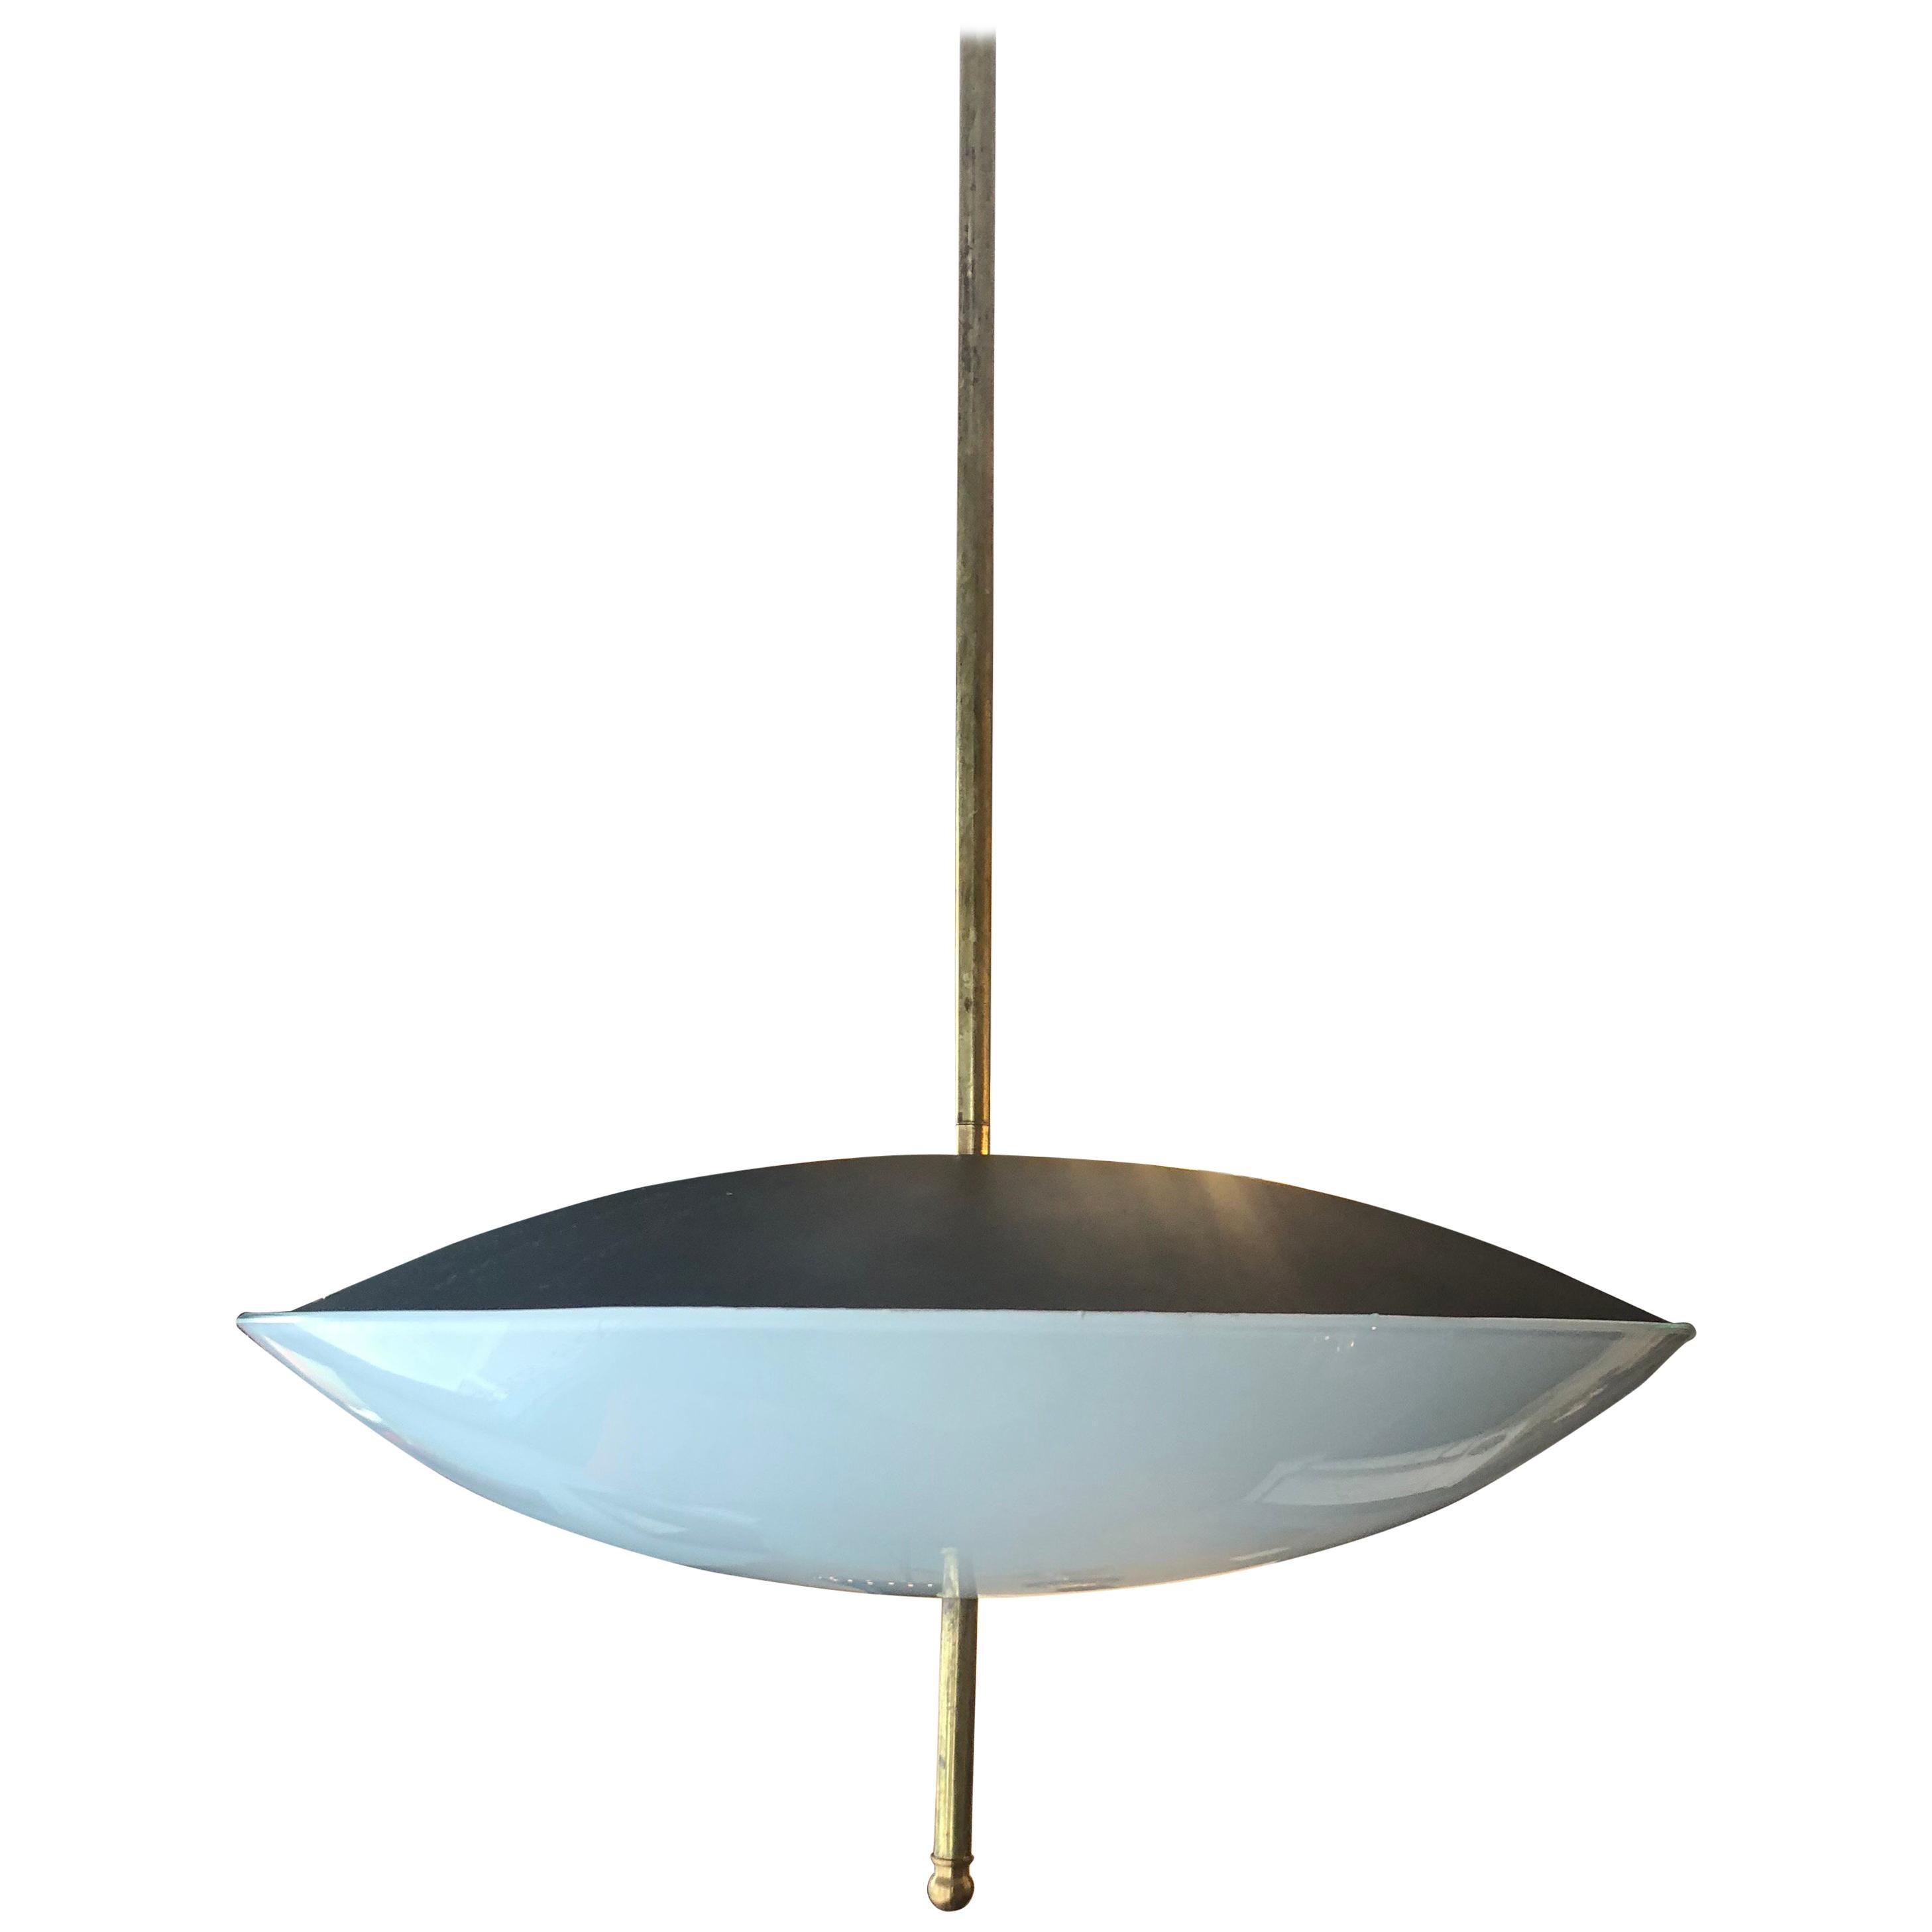 Midcentury Italian Pendant Ceiling Light